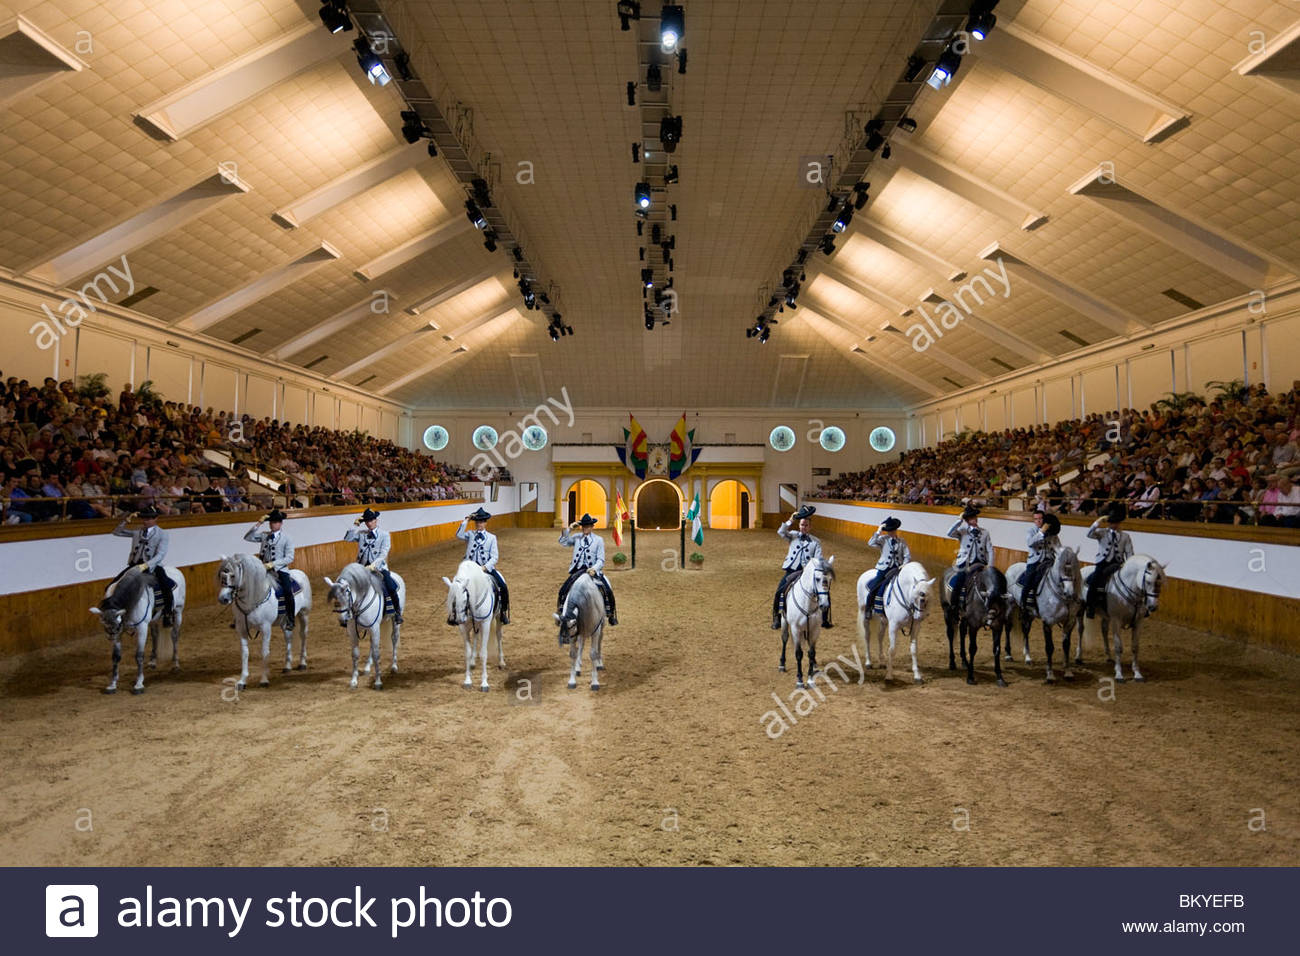 Königliche Hofreitschule in Jerez De La Frontera, Andalusien, Provinz Cadiz, Spanien Stockbild